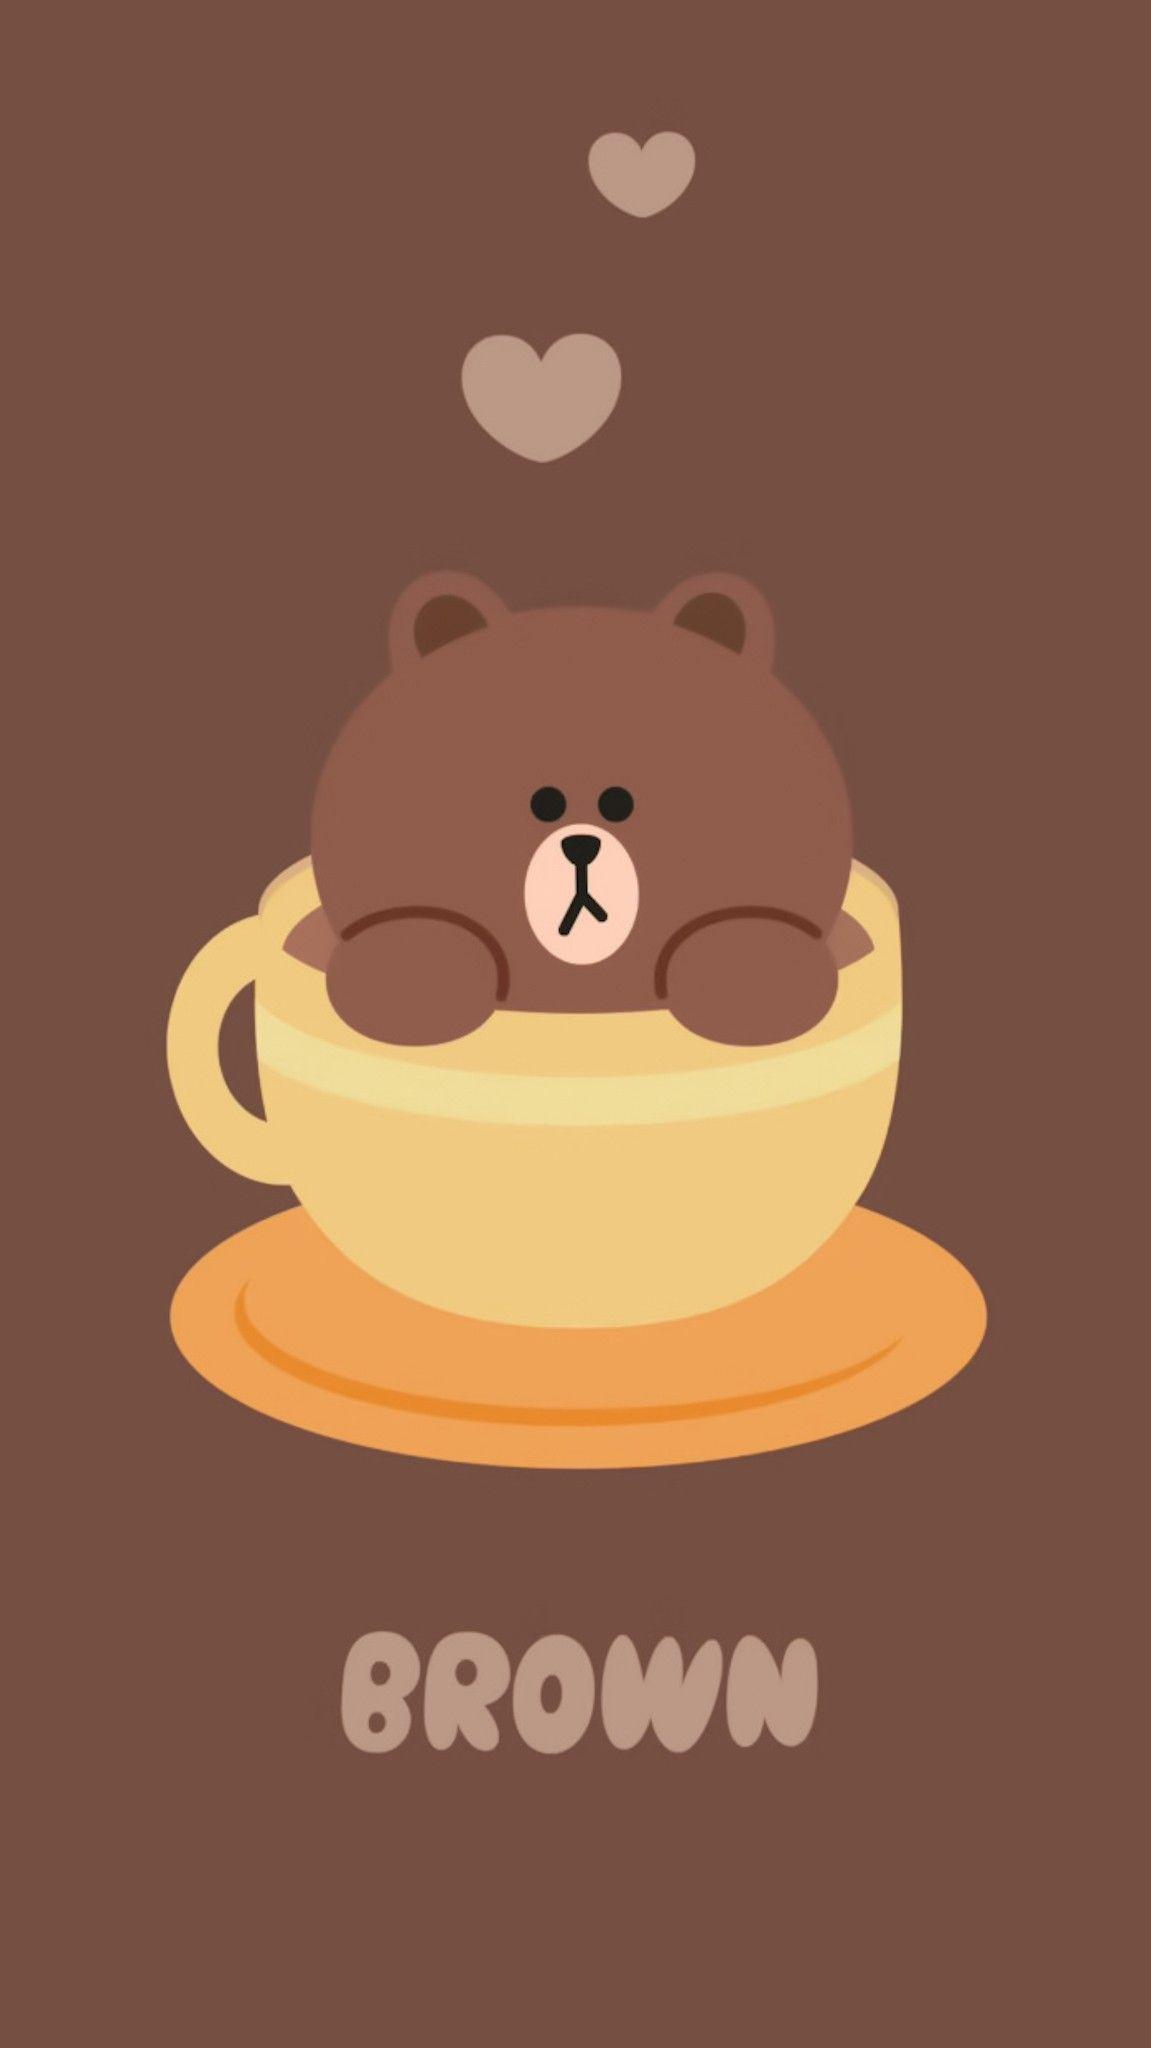 Pin Oleh Aekkalisa Di Line Friends Bg Lukisan Lucu Beruang Coklat Kartun